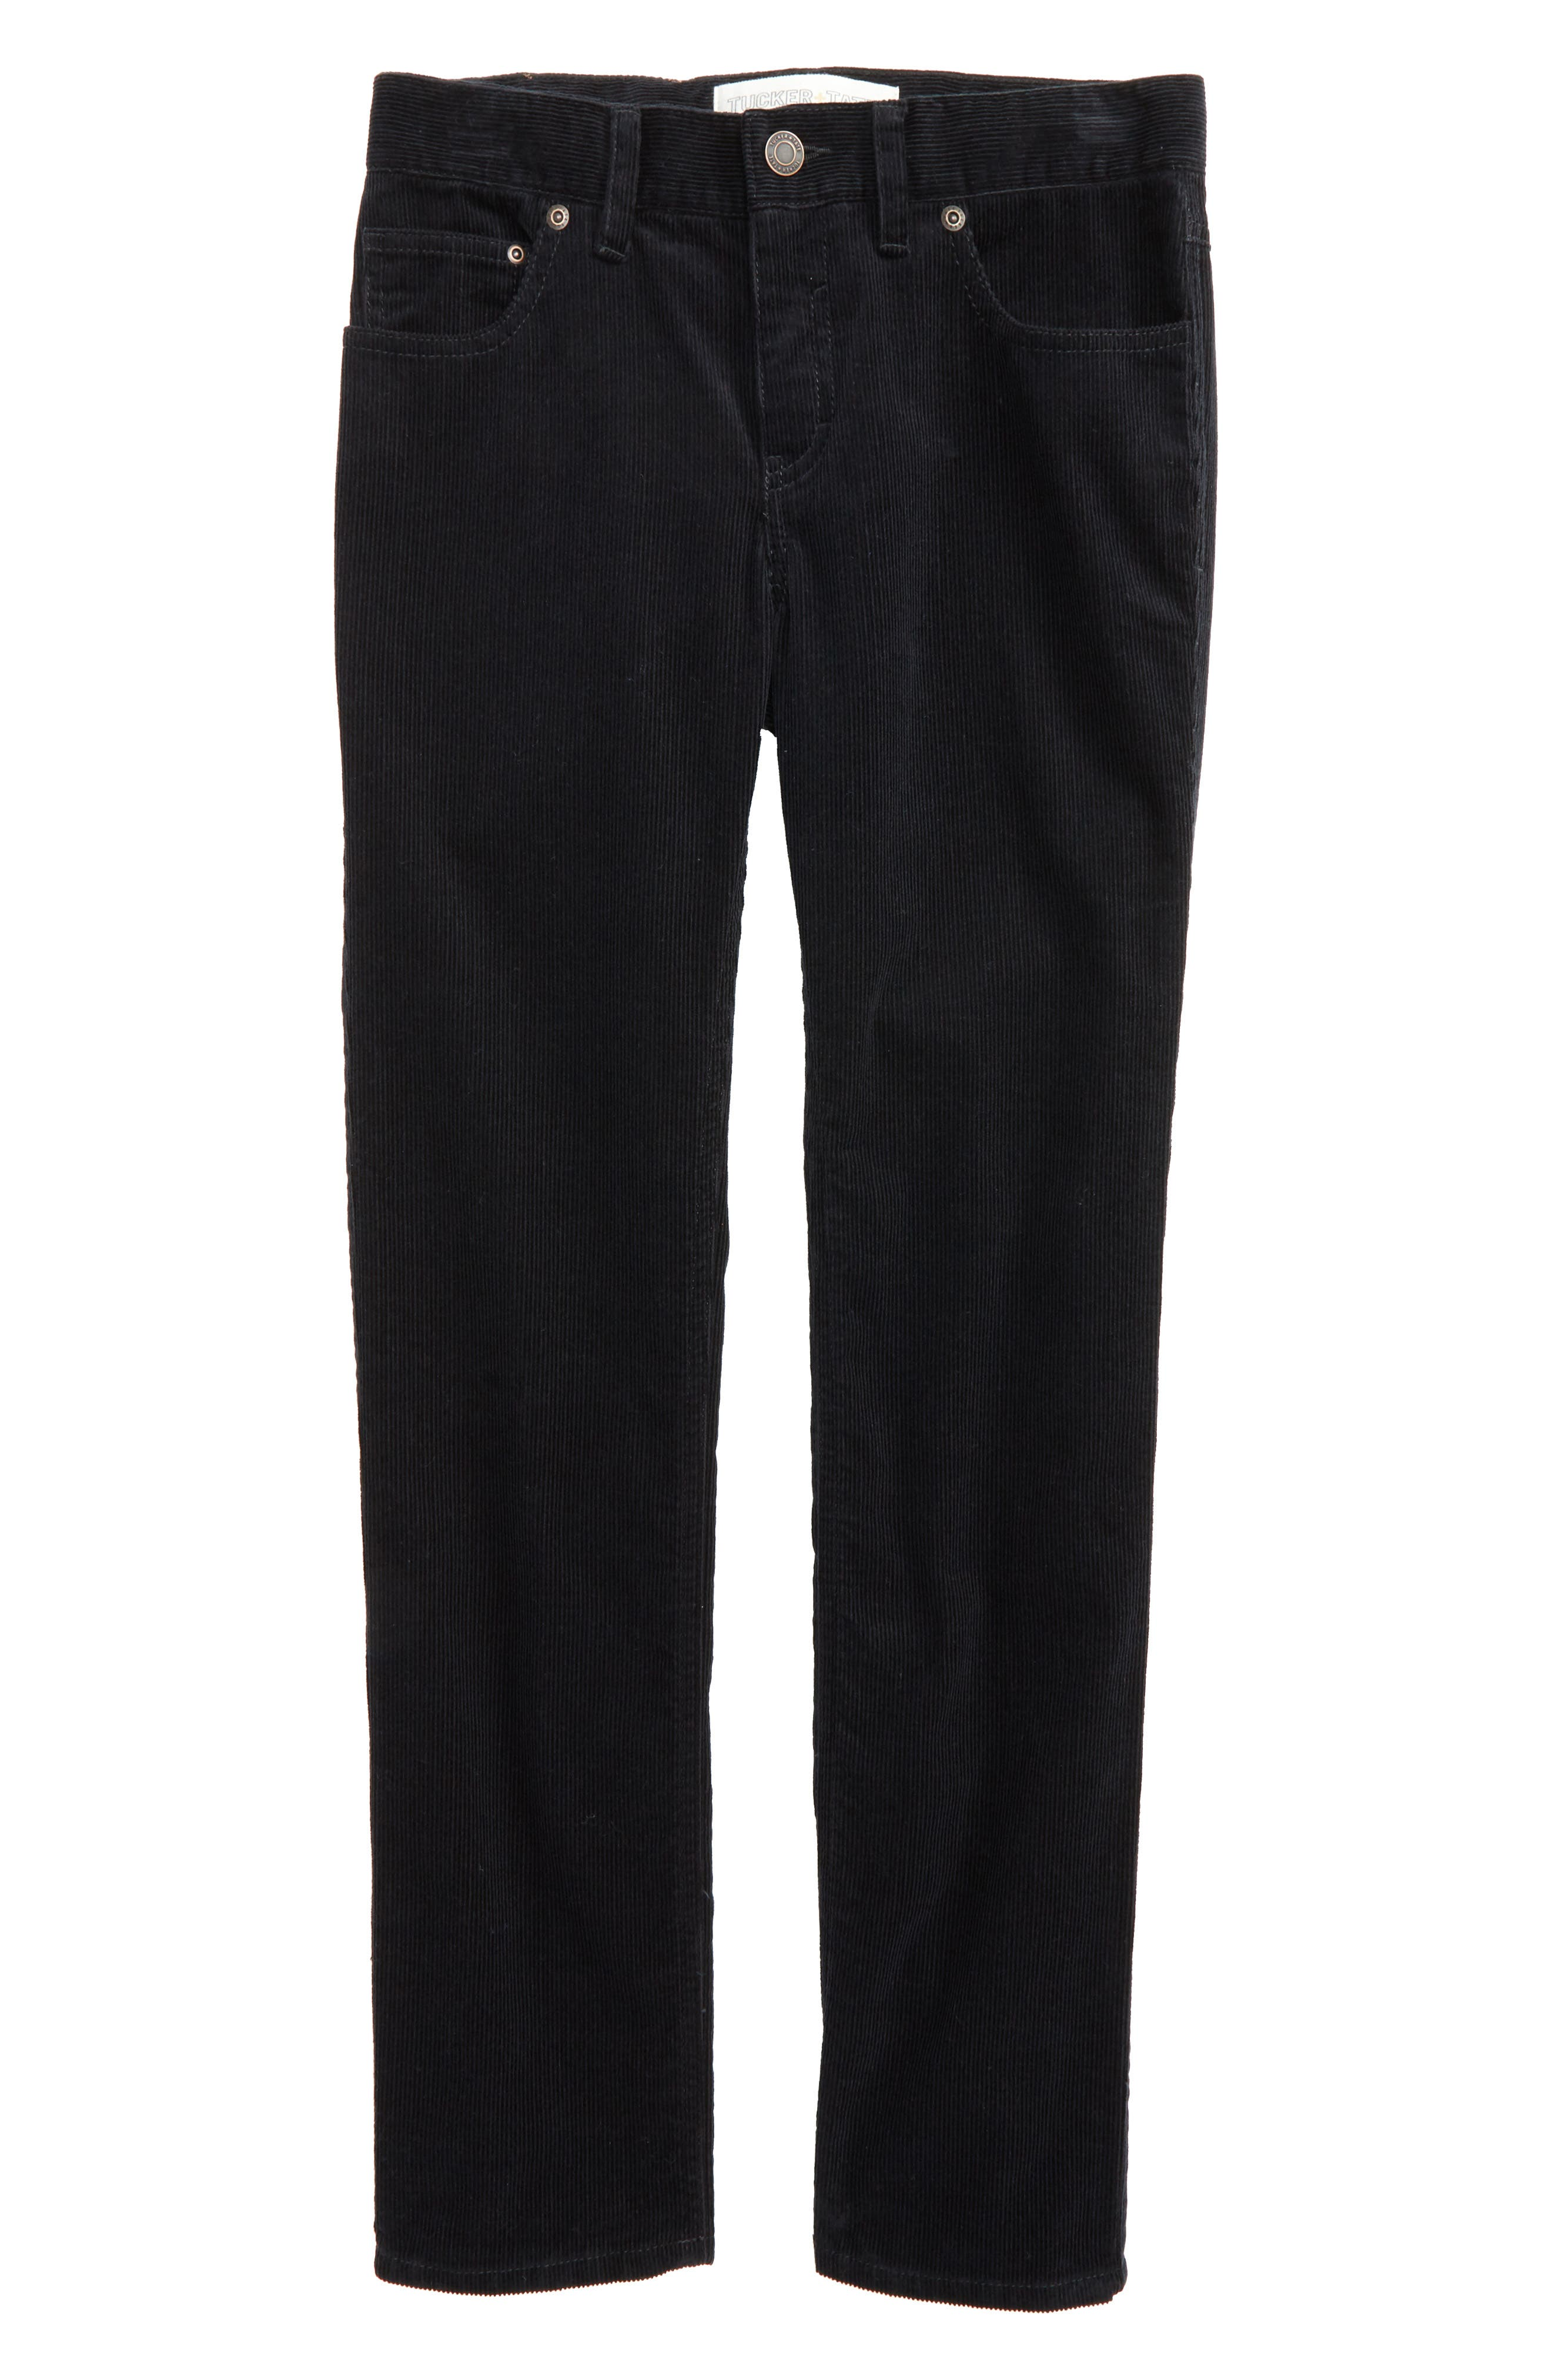 'Townsend' Corduroy Pants,                             Main thumbnail 1, color,                             Black